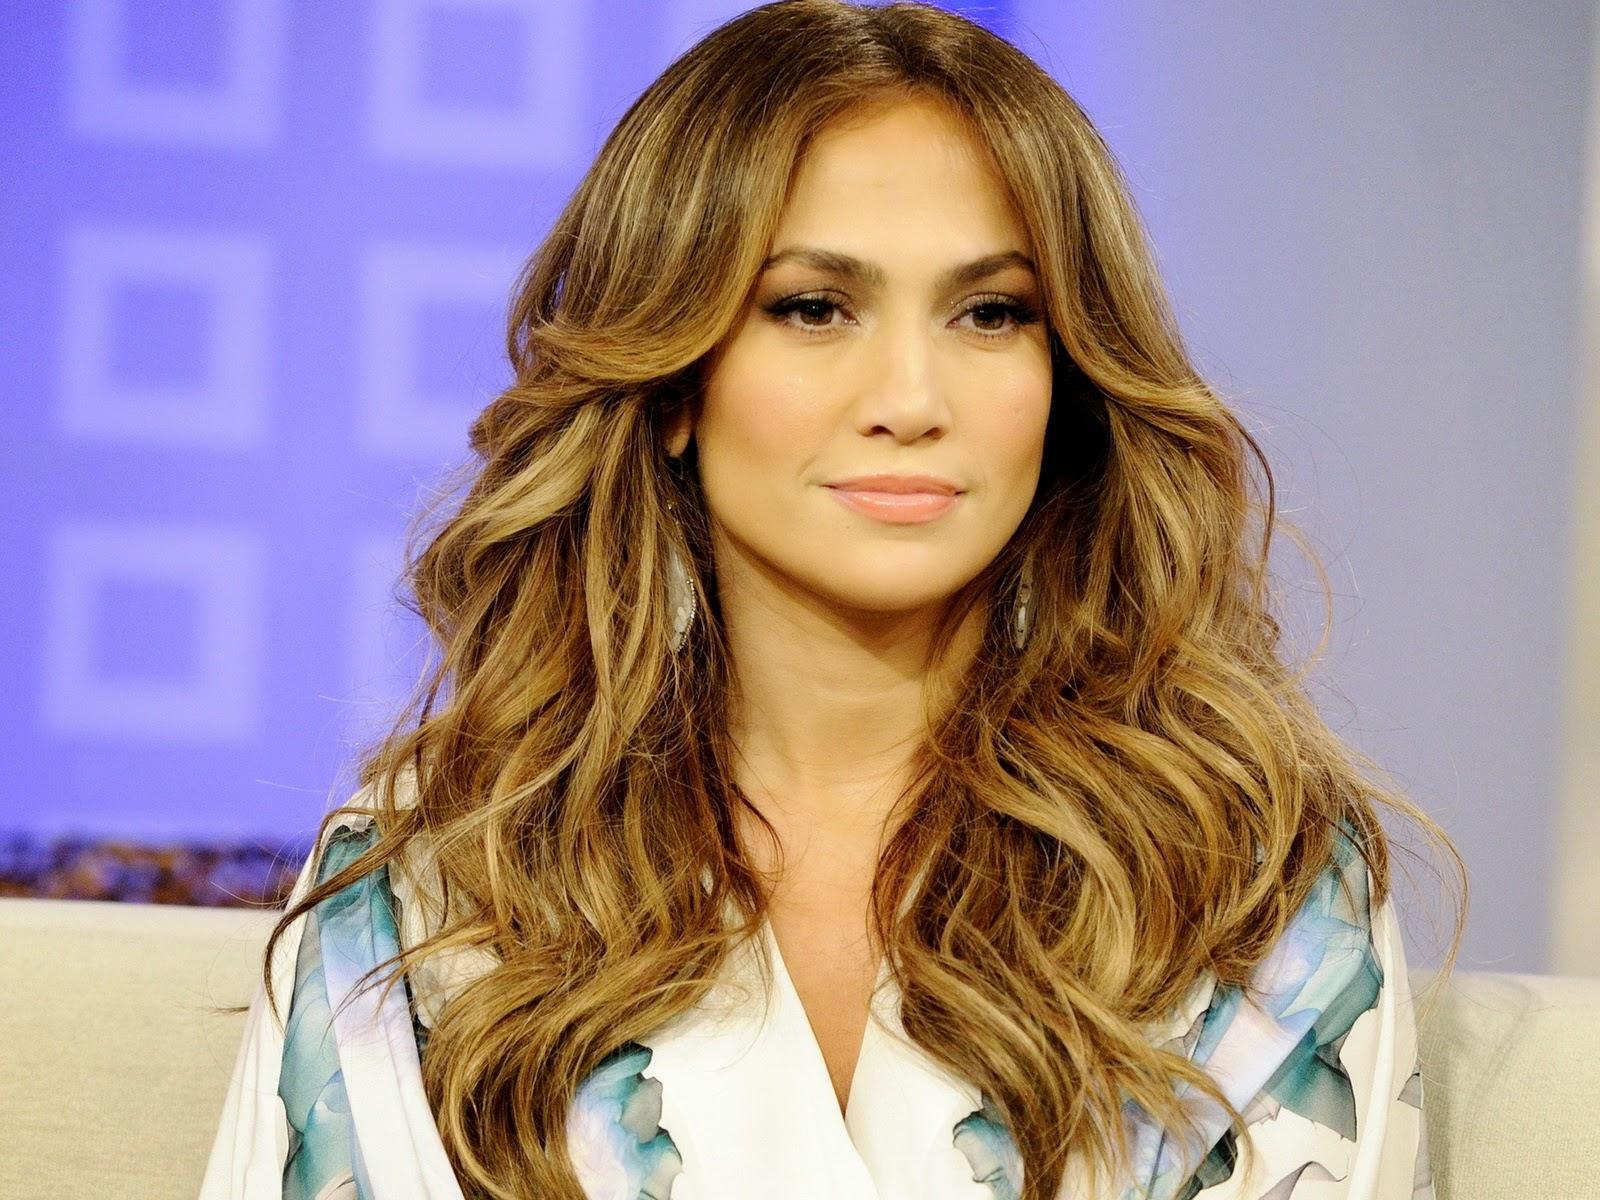 10 Lagu Jennifer Lopez Terbaik dan Terpopuler